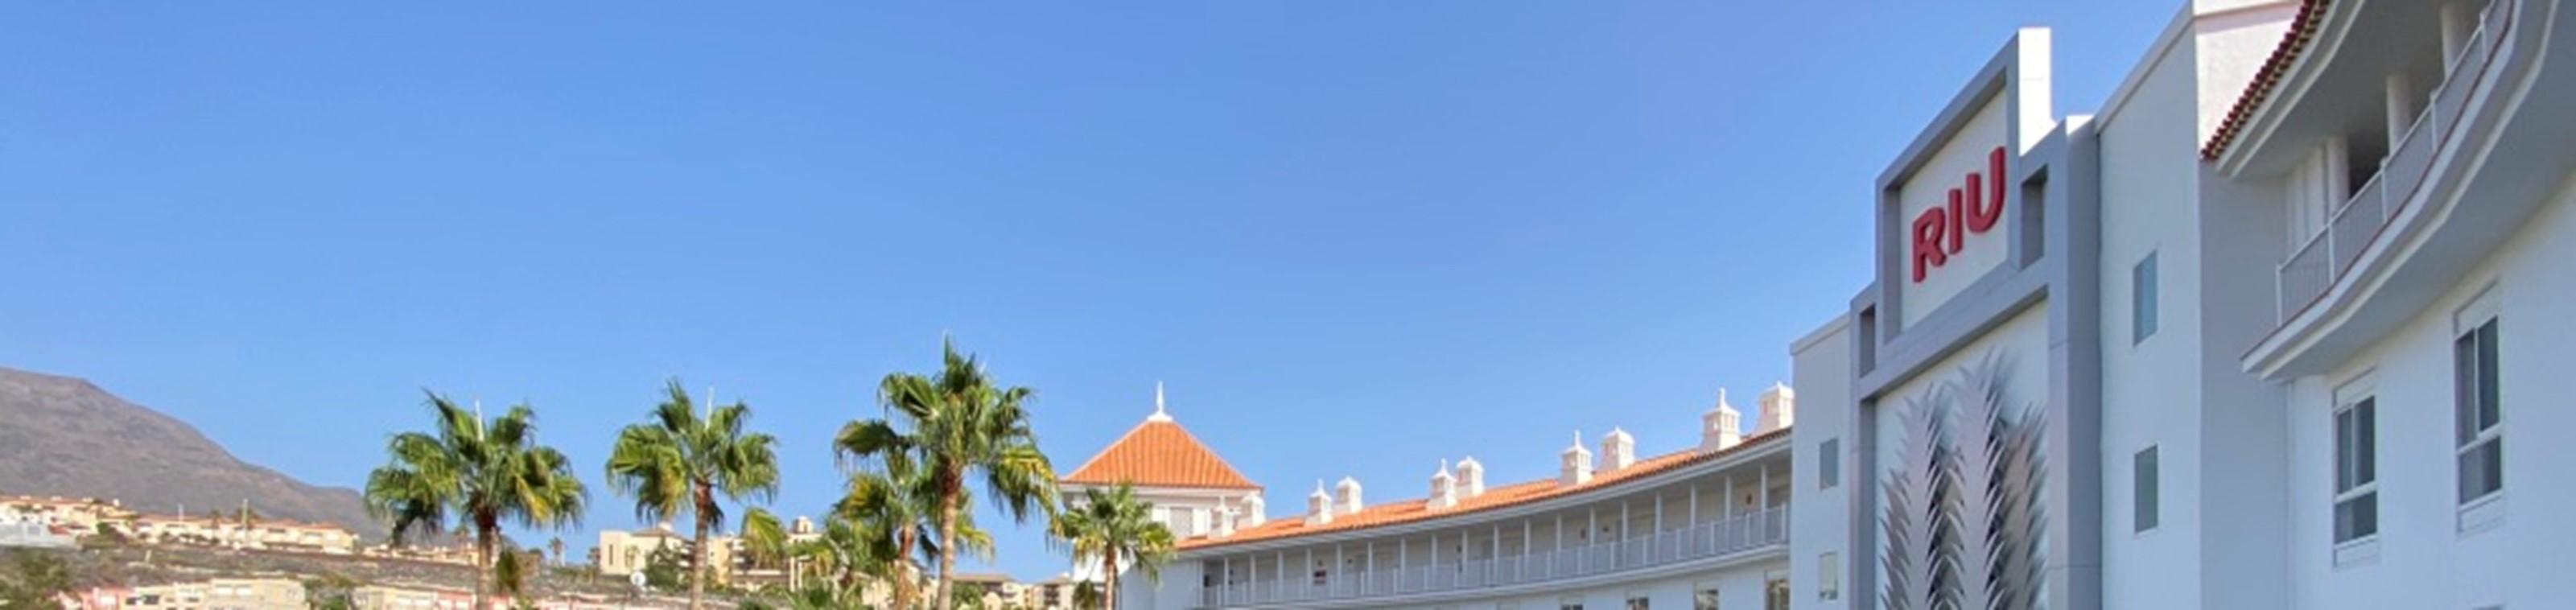 Adults only RIU hotel in Costa Adeje (Tenerife)